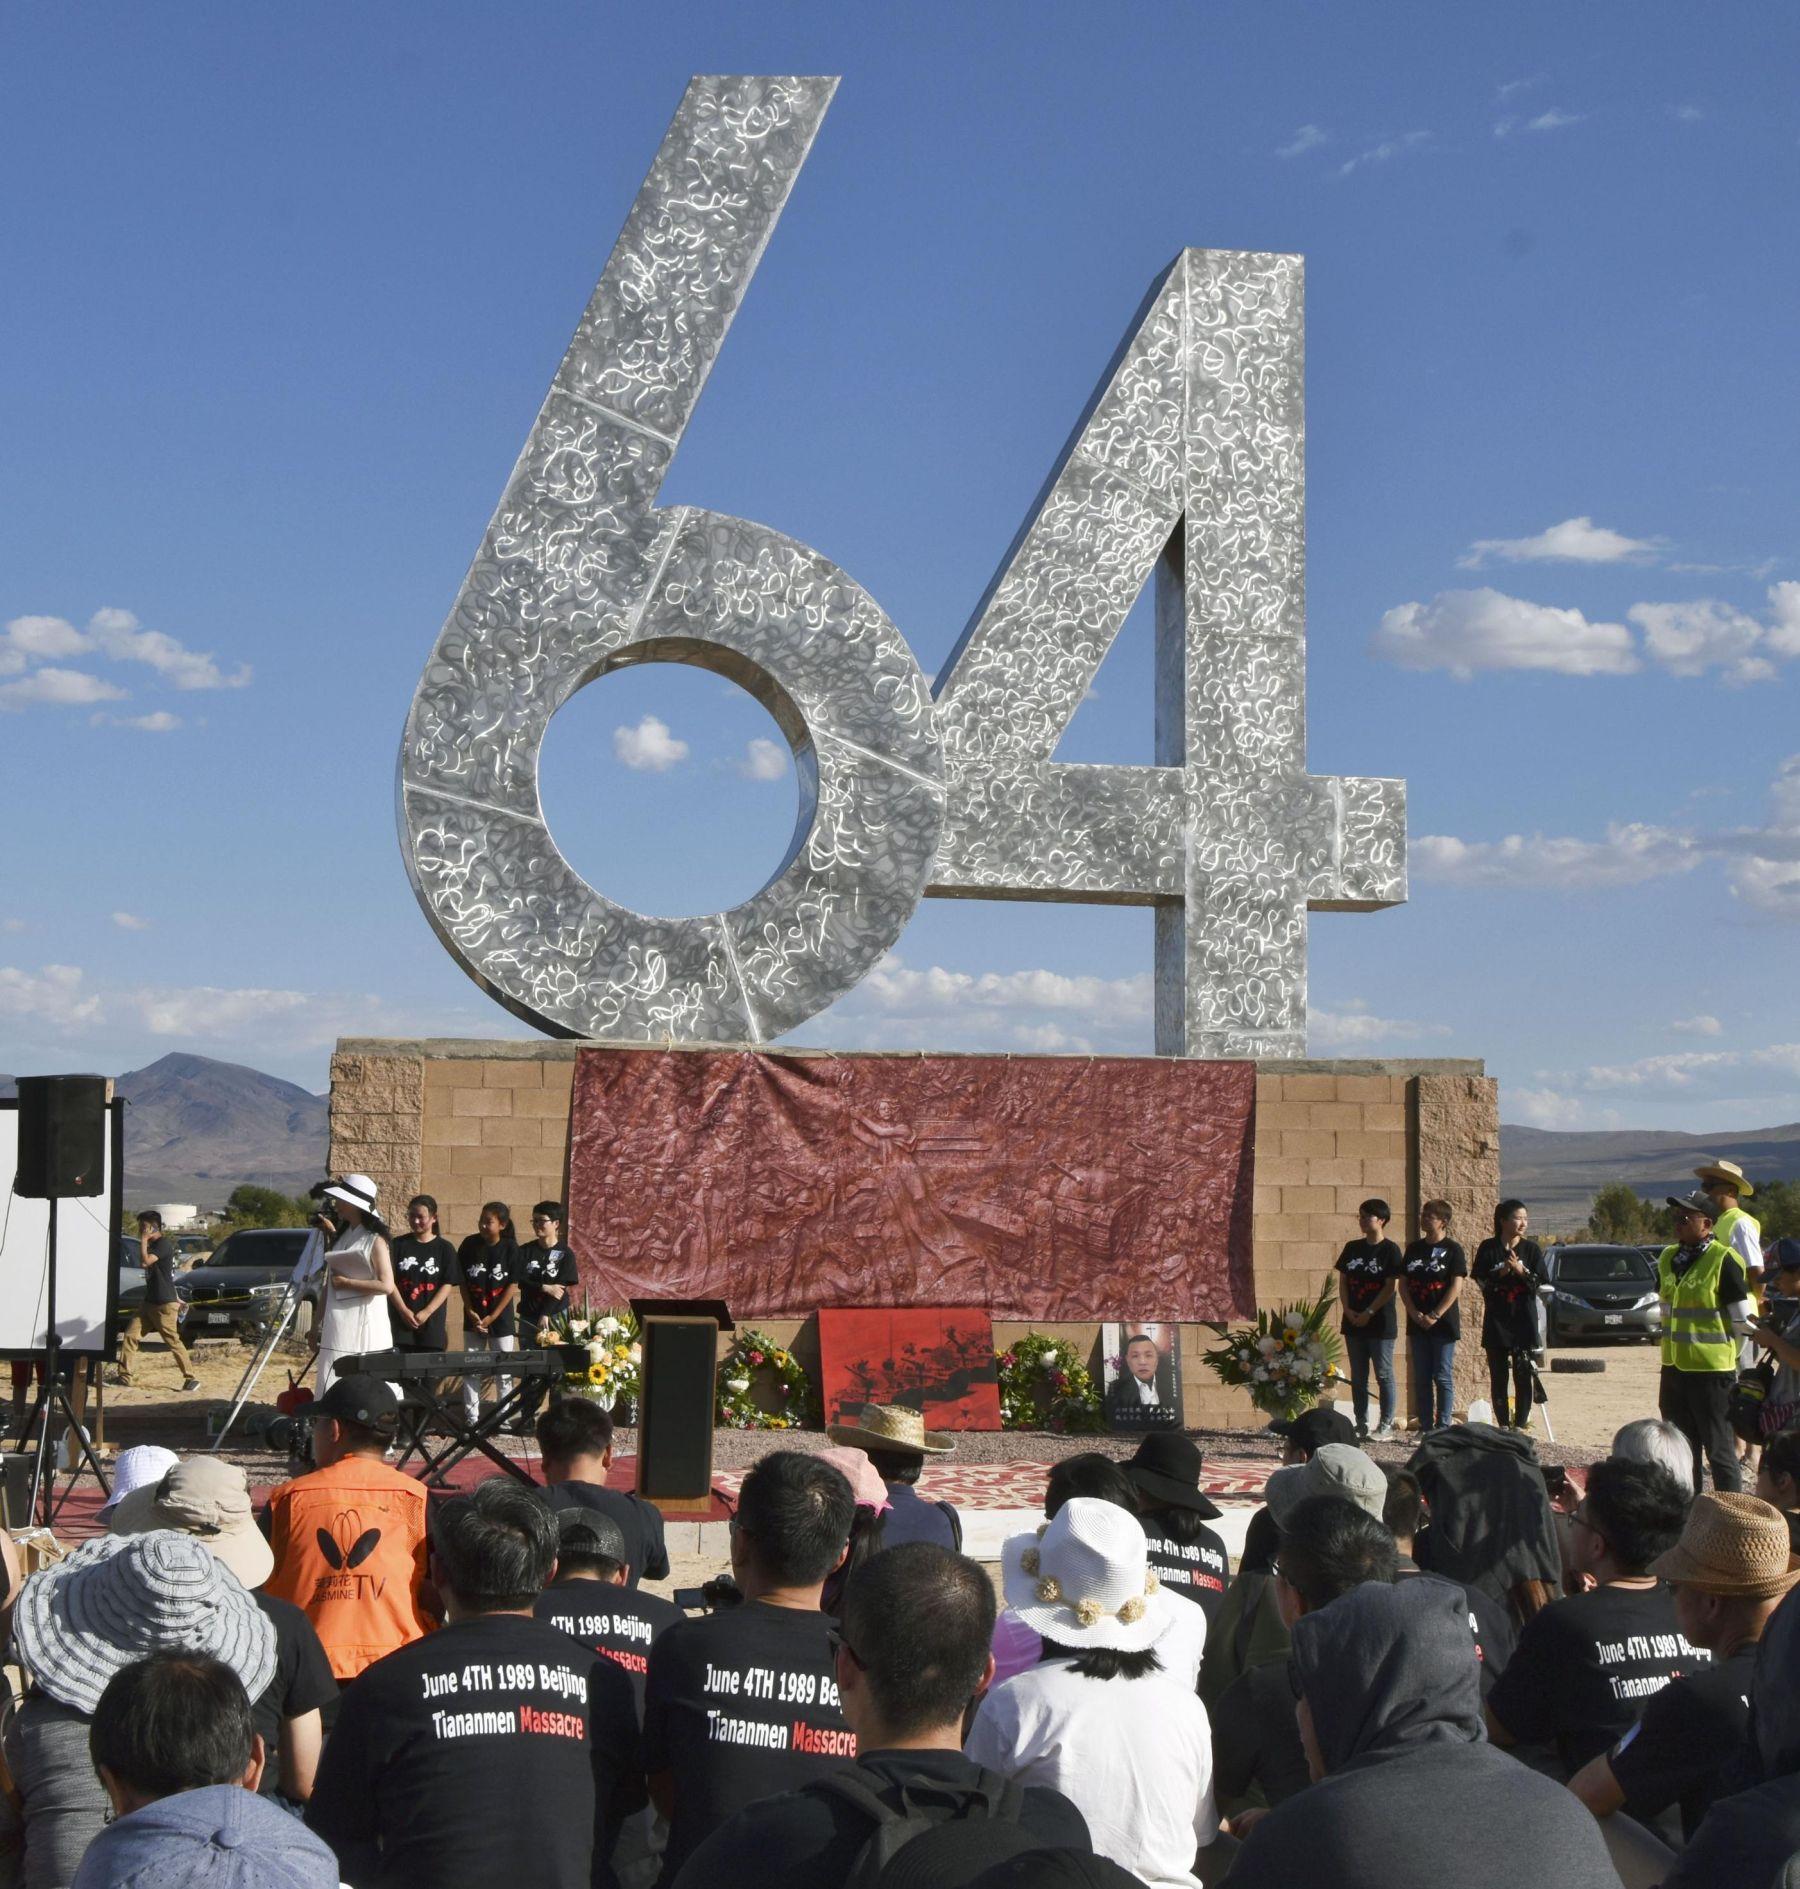 China Beijing 30th Anniversary of Tiananmen Square Incident 022